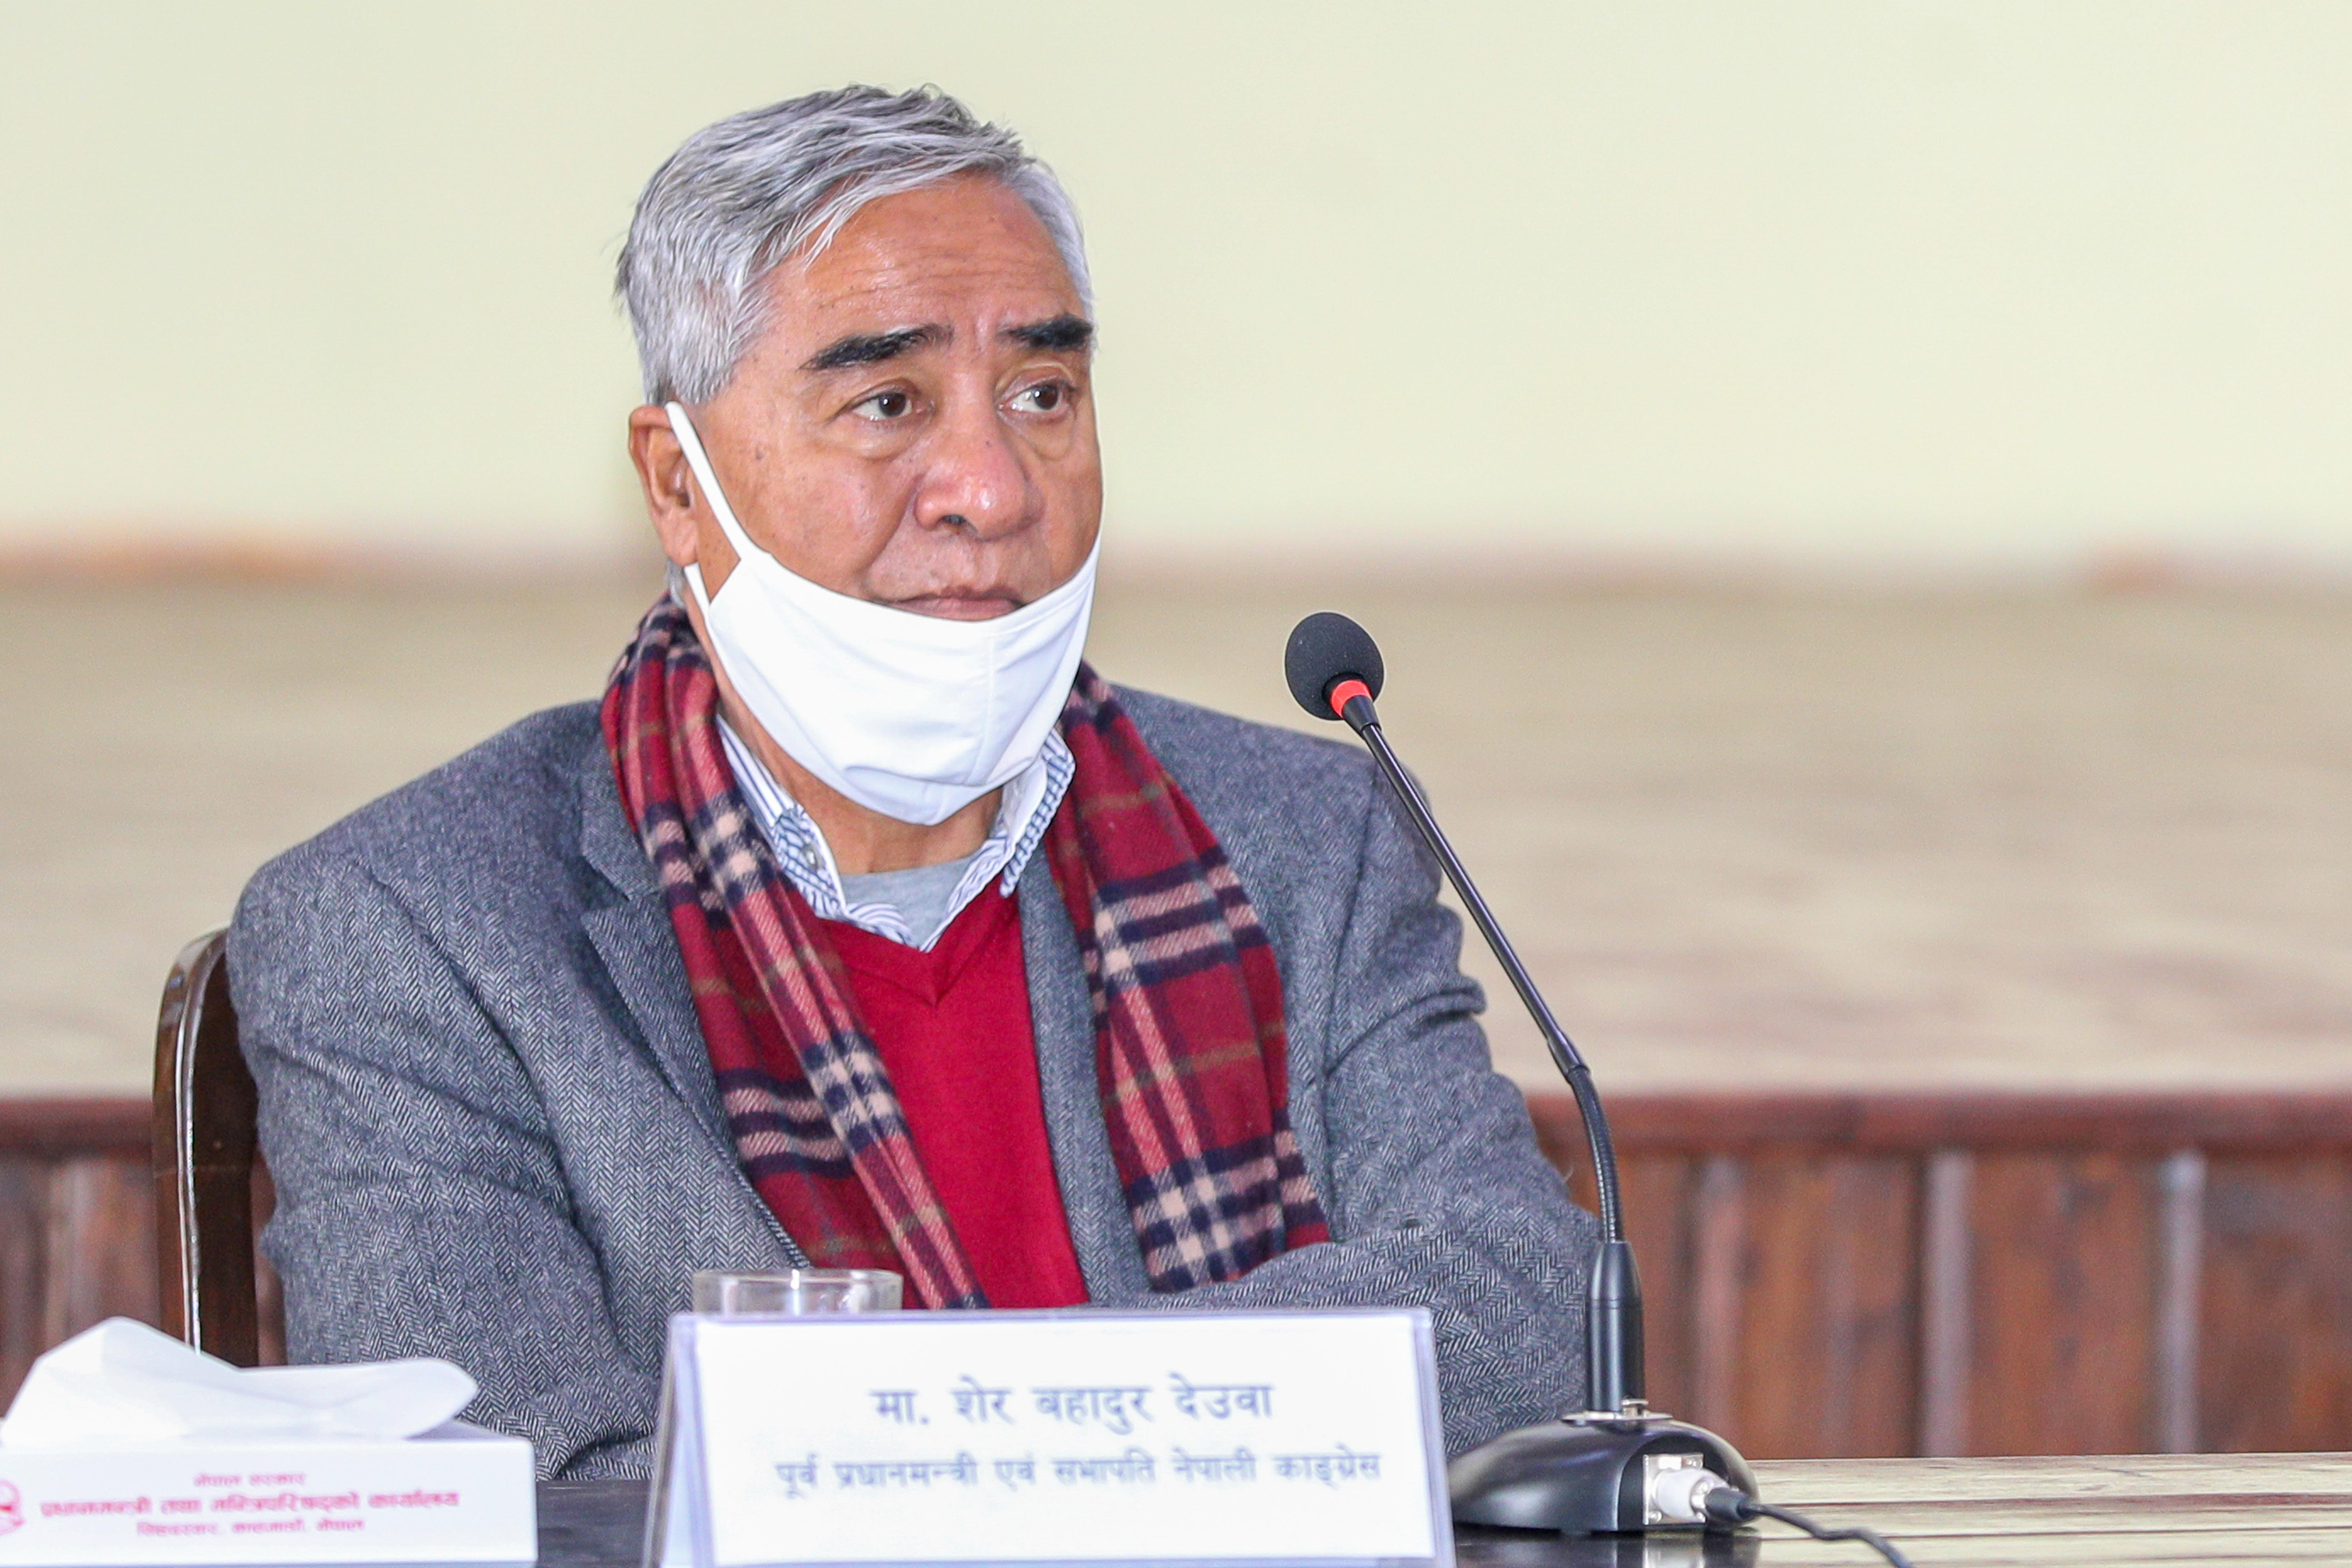 Photo Courtesy: Rajan Kafle/Prime Minister's Secretariat